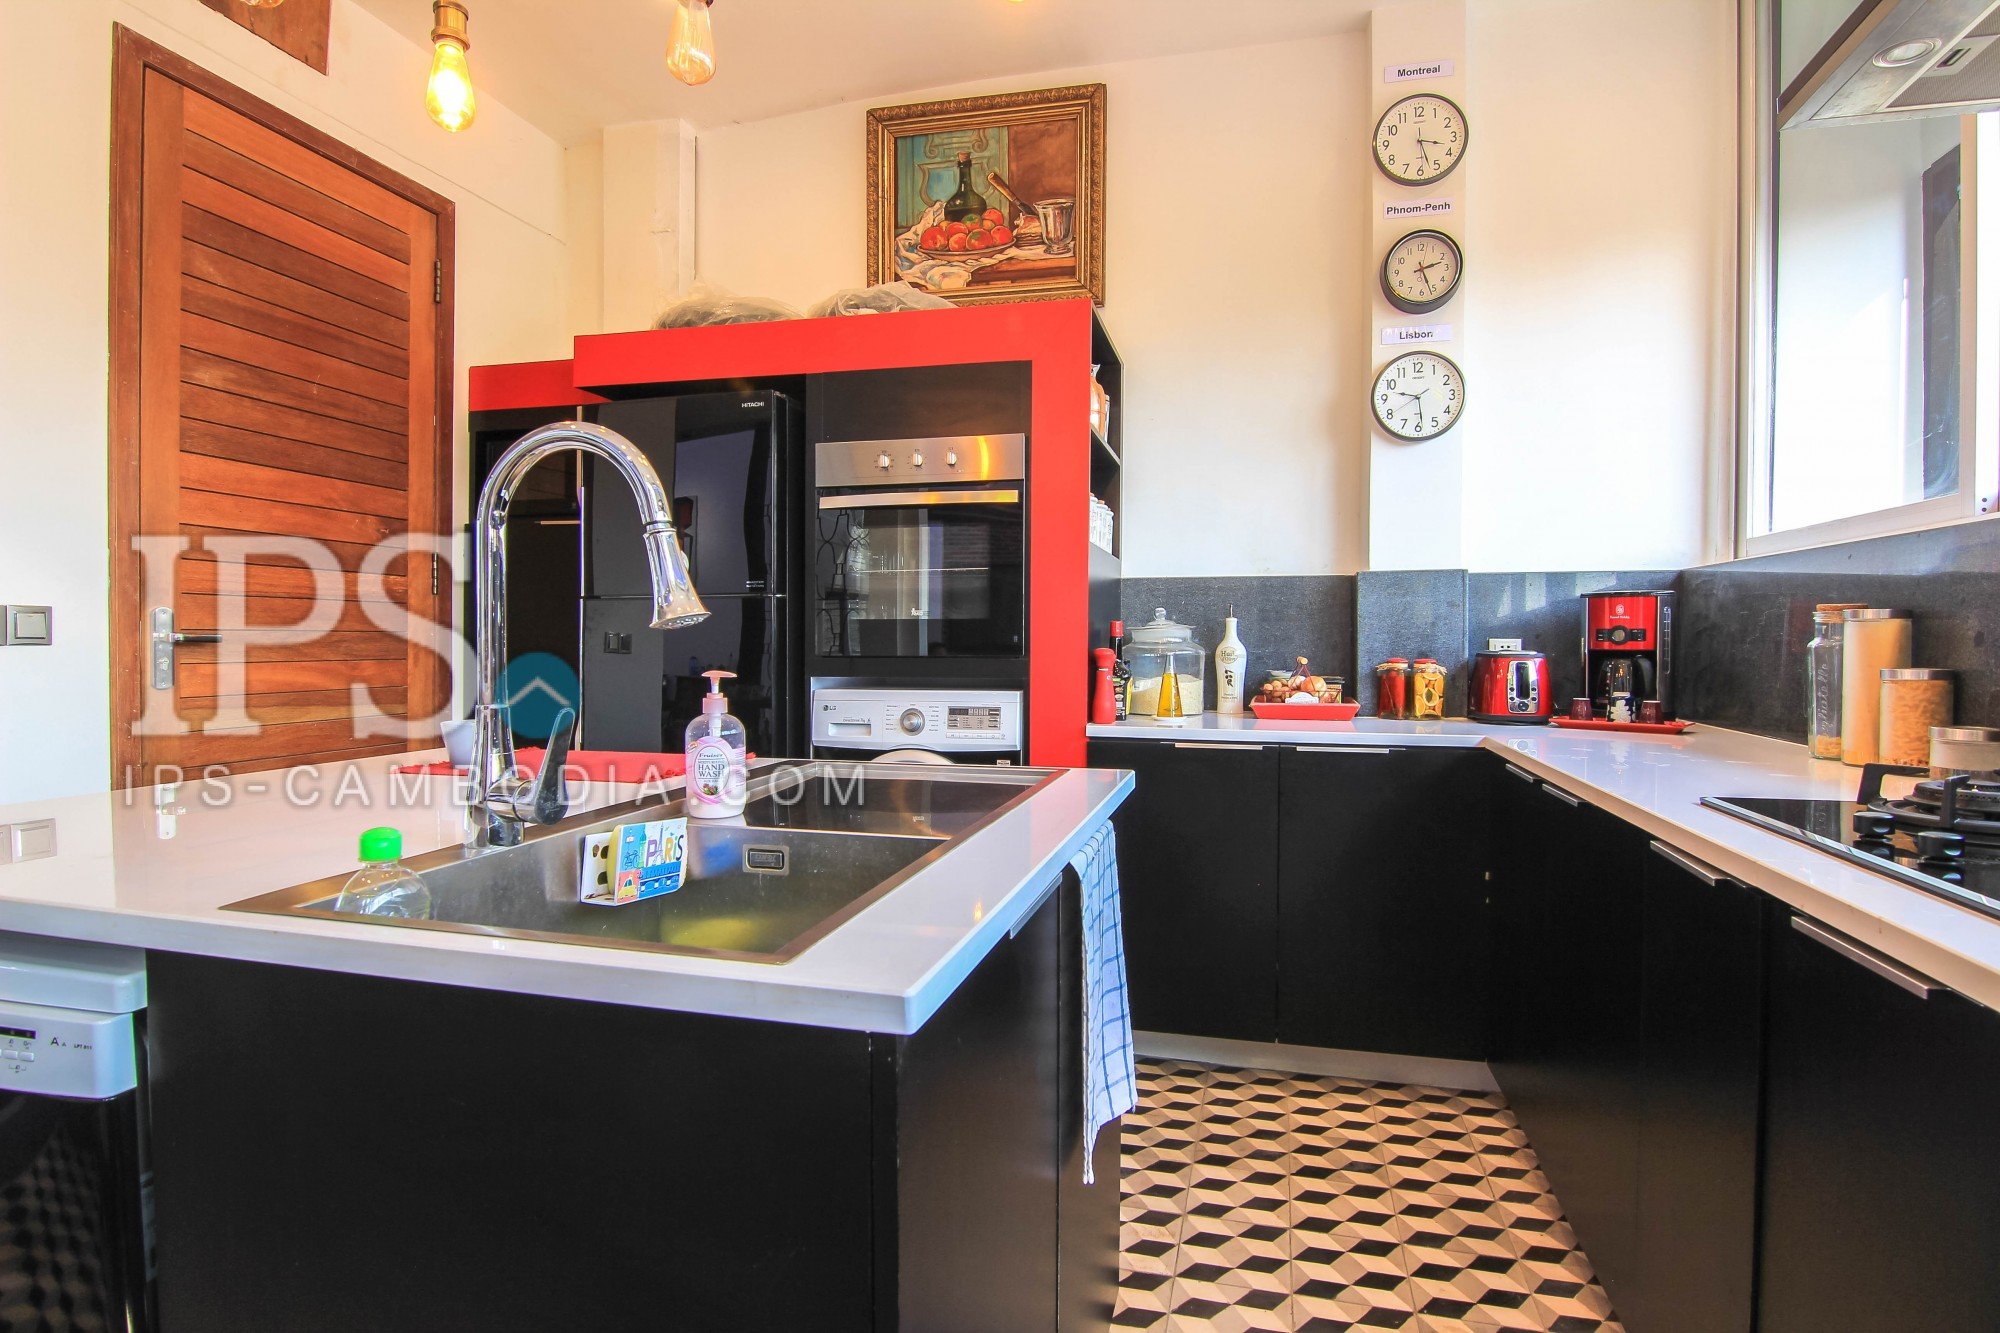 3 Bedroom Apartment/Flat For Sale - Mittapheap, Phnom Penh